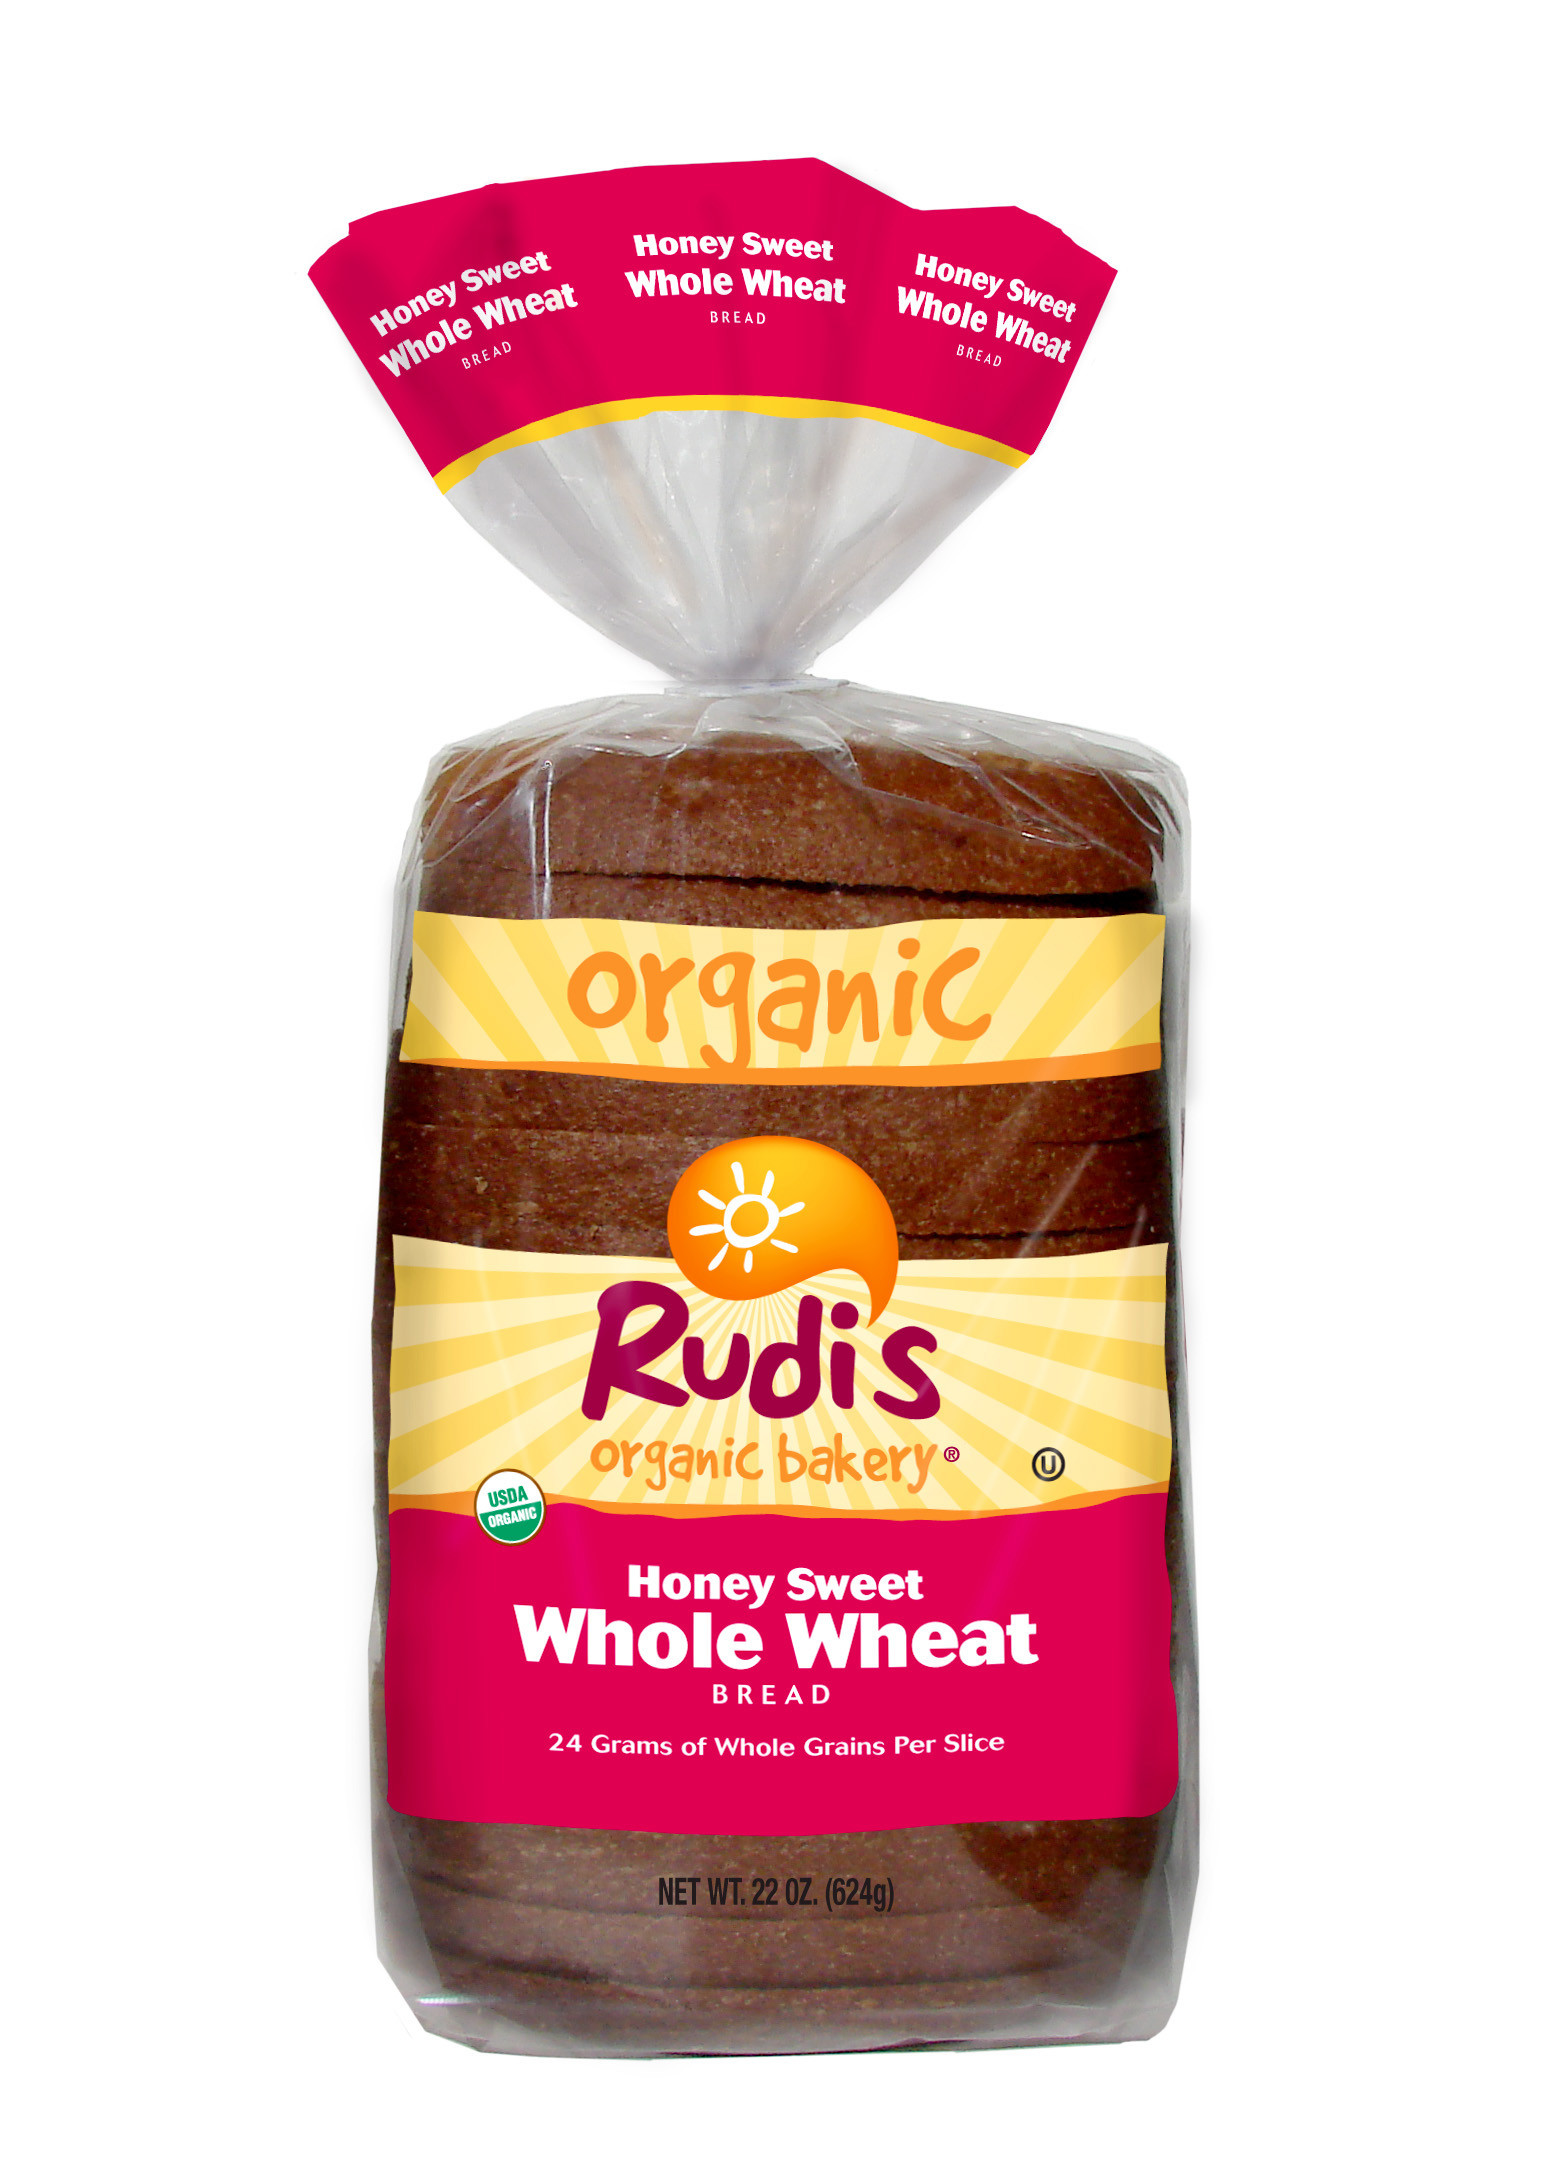 Gluten Free Organic Bread  Rudi s Organic and Gluten Free Bakery Breads Voted to KIWI